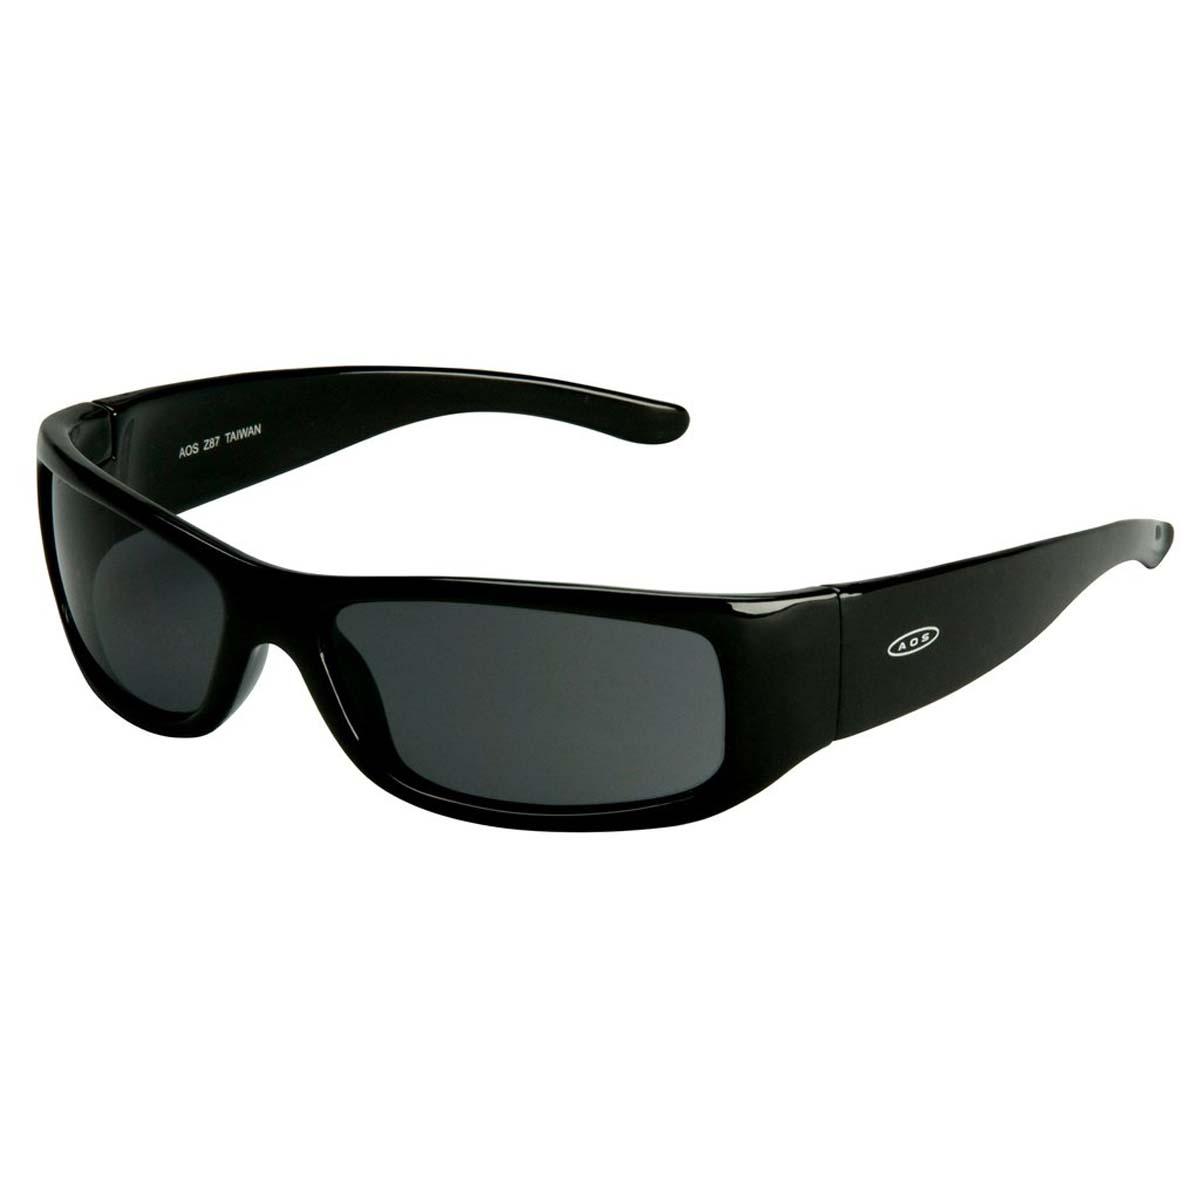 "3Mâ""¢ Moon Dawgâ""¢ Protective Eyewear 11215-00000-20 Gray Anti-Fog Lens, Black Frame"